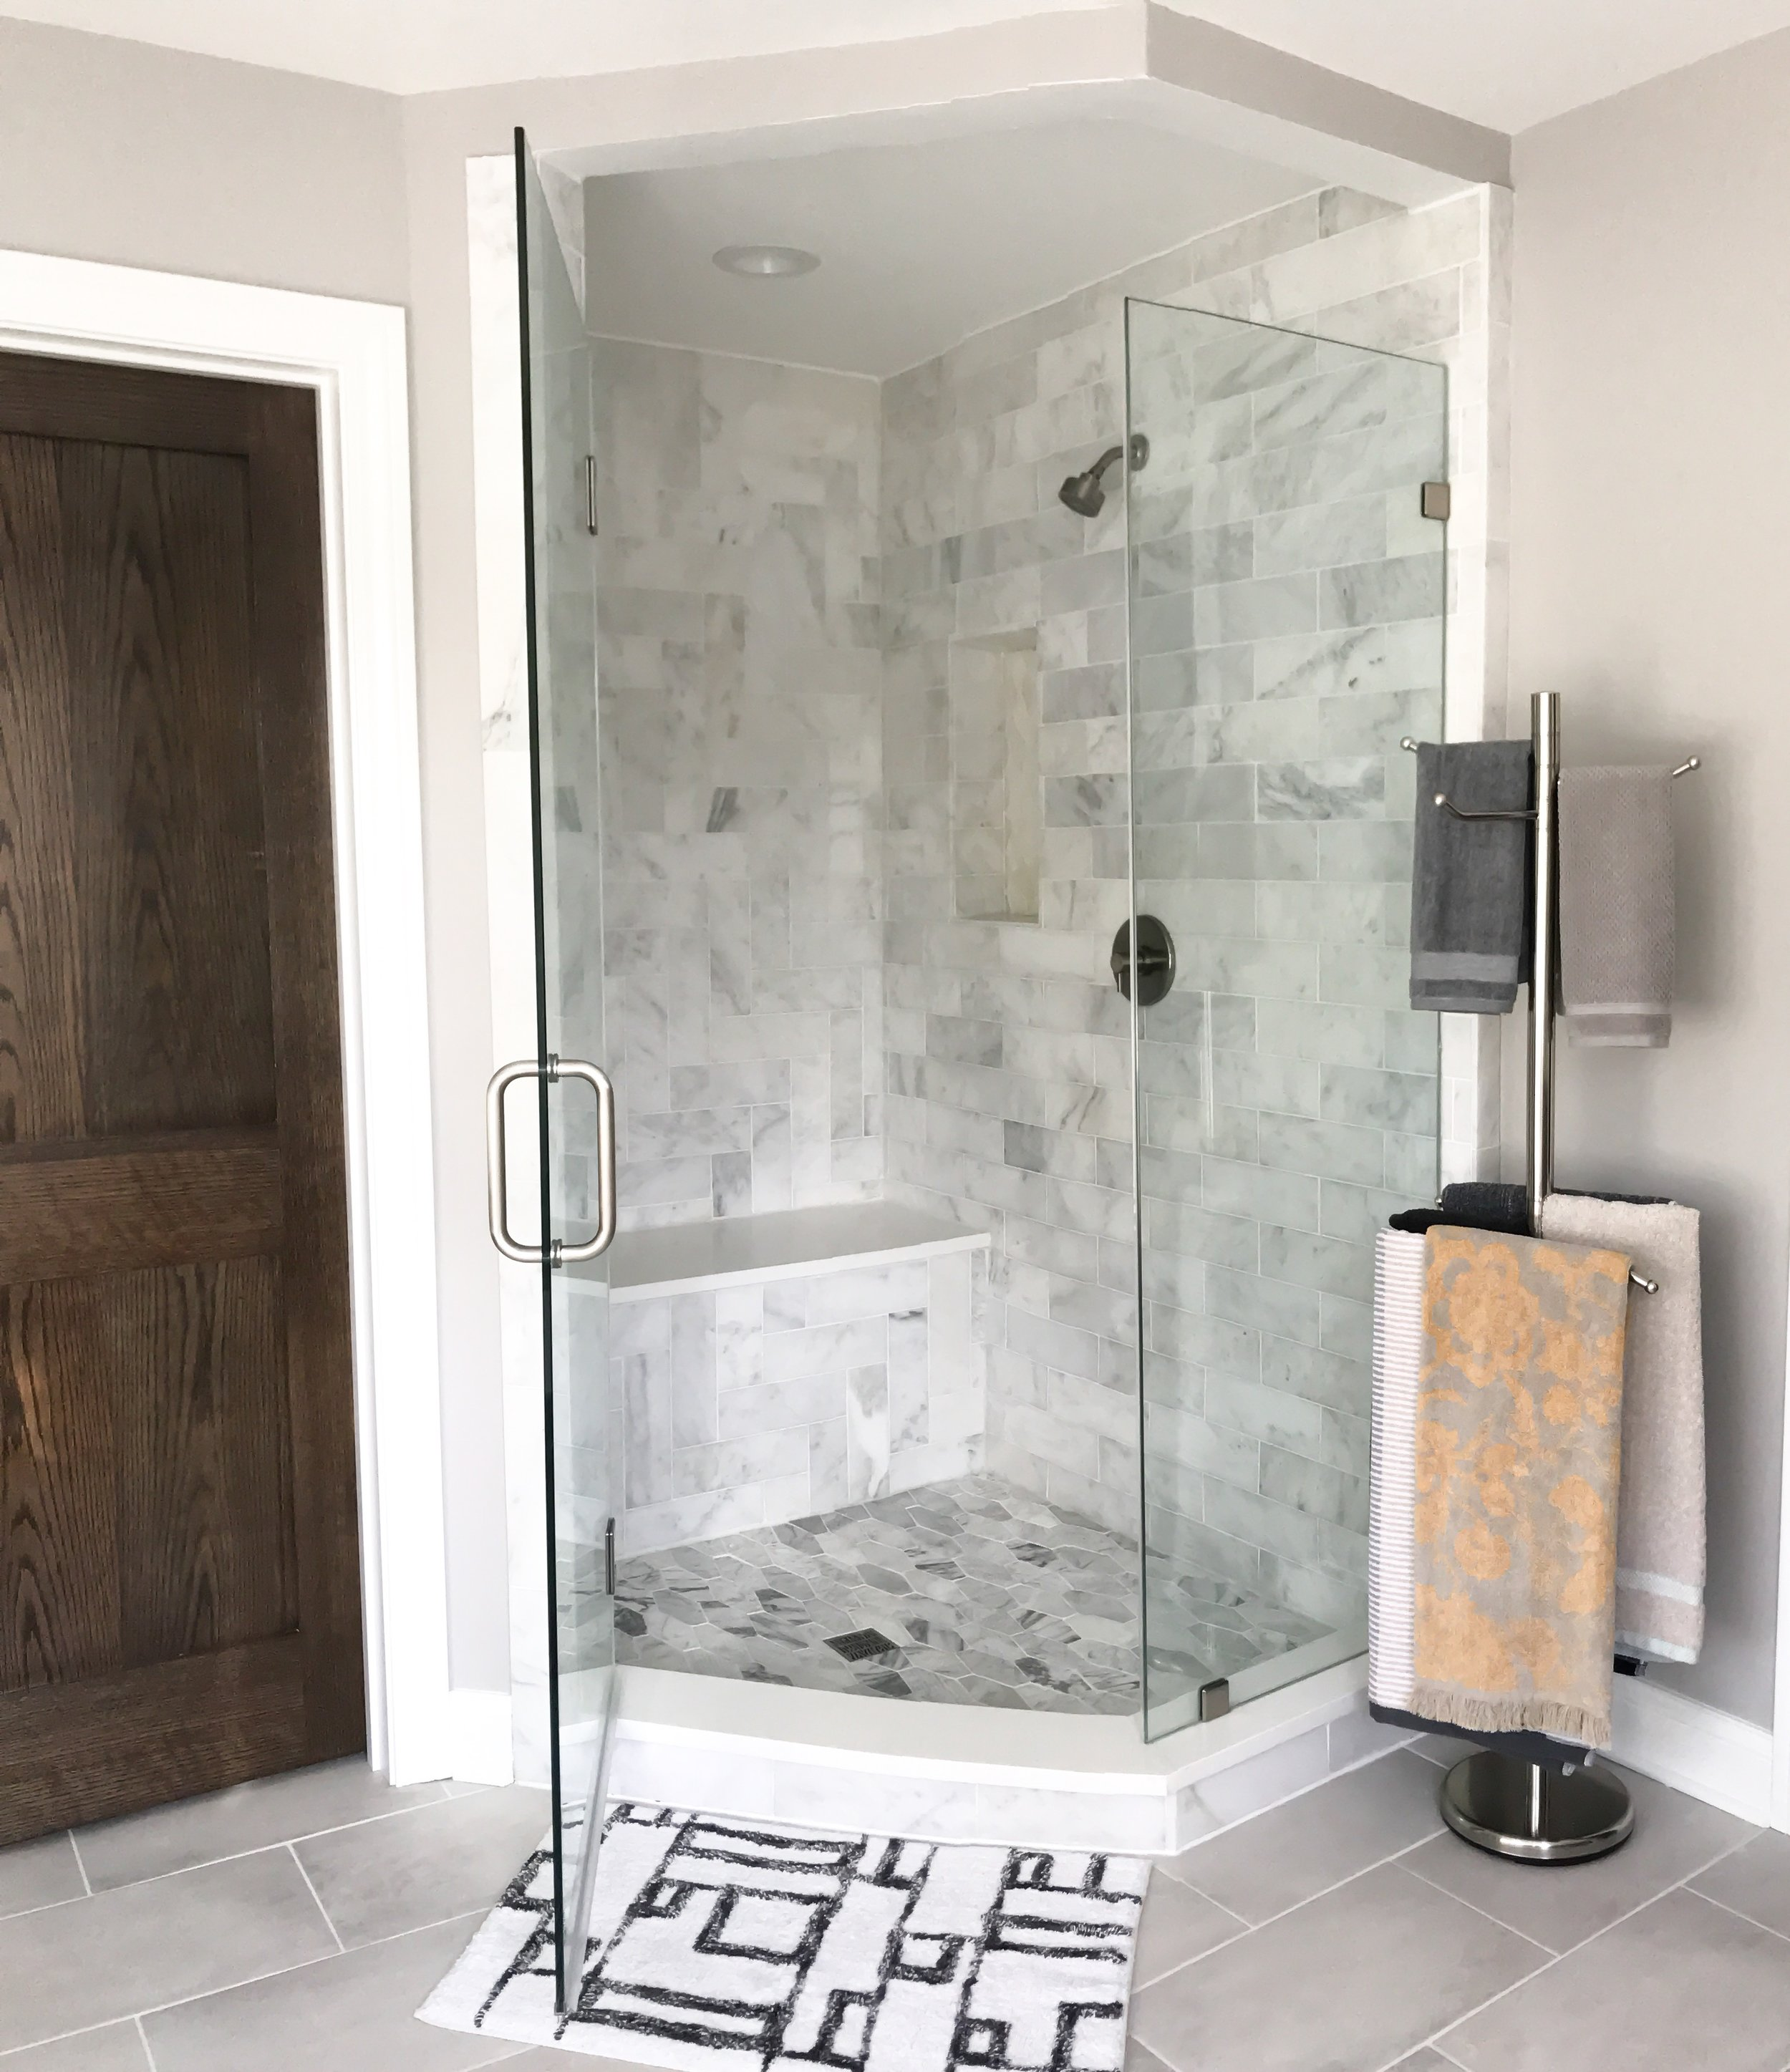 Master Bathroom Shower Ideas. Freestanding towel rack. Glass shower doors. Glass Modern Shower. Designing A Master Bath. Bathroom remodeling ideas. Modern bathroom design. New bathroom construction. Master bathroom freestanding tub and marble shower ideas. #wetstyle #sponsored #newconstruction #modern #master #bathroom